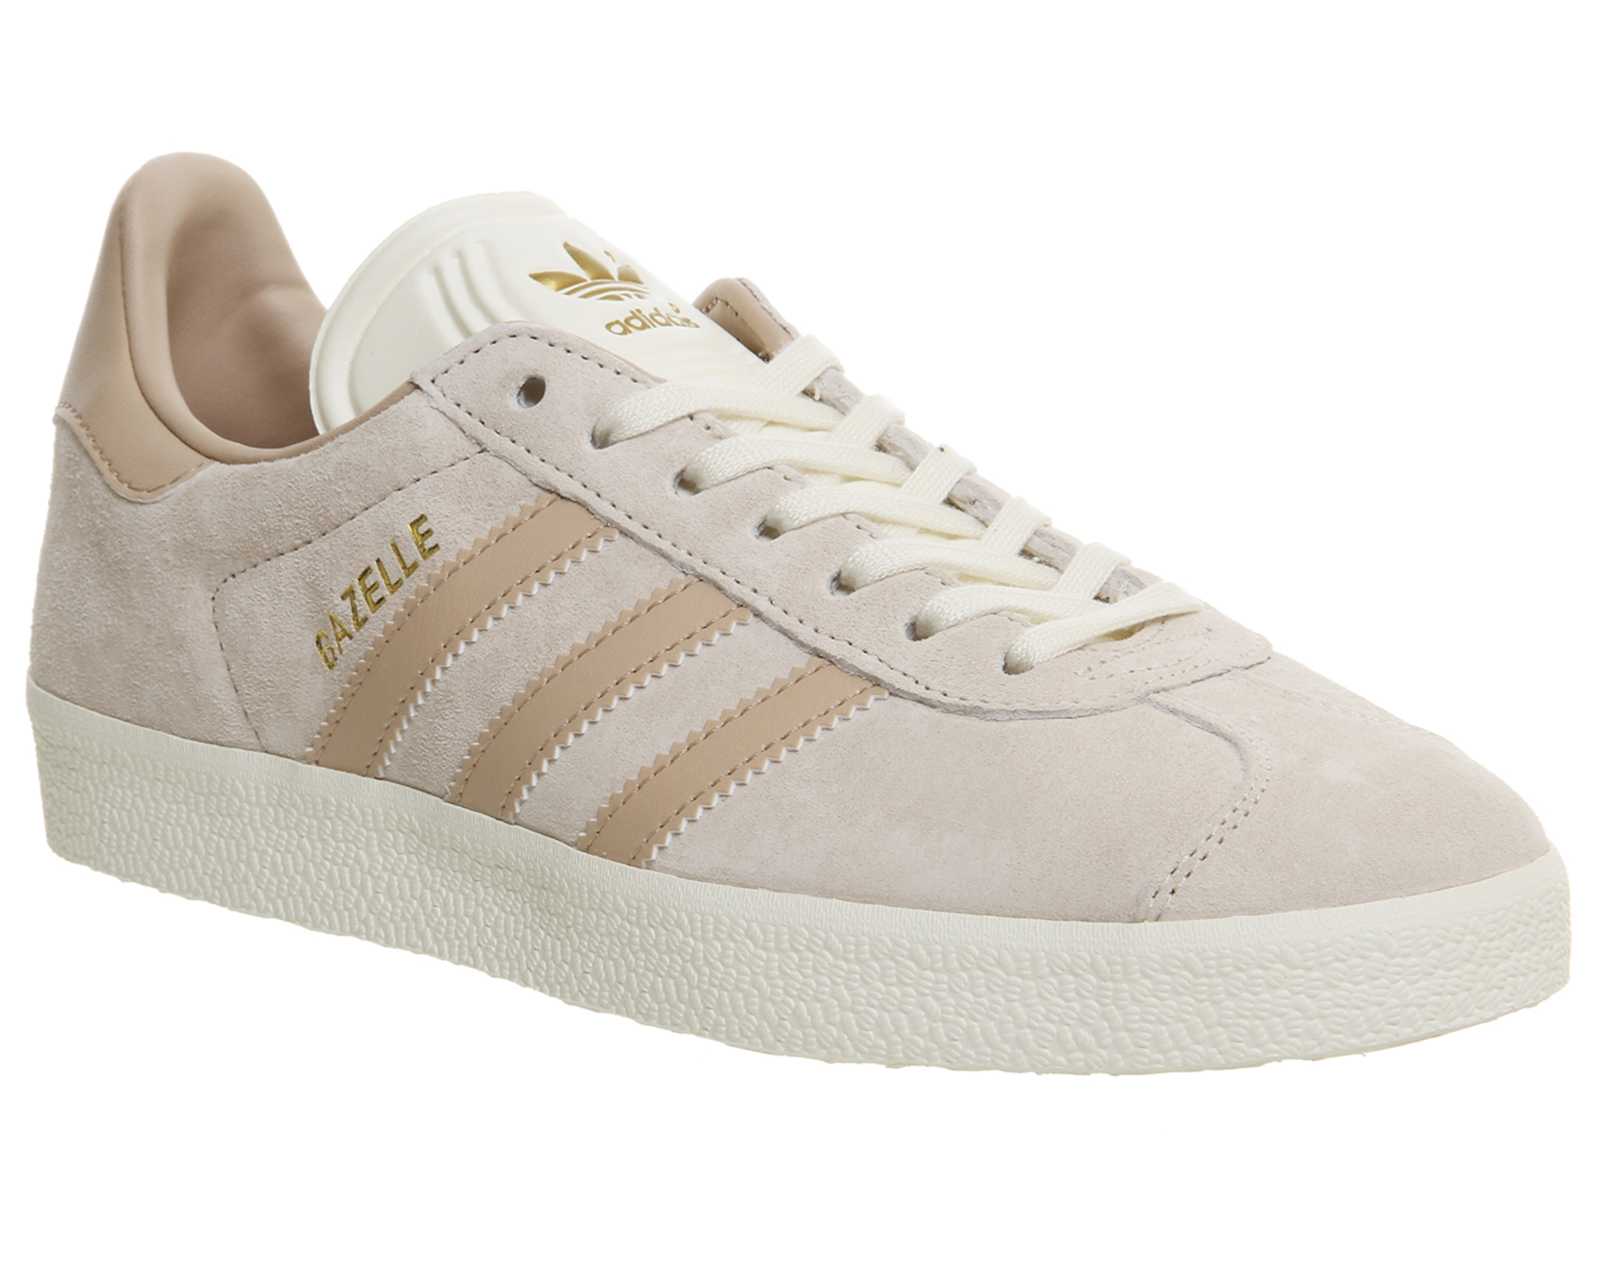 womens adidas gazelle trainers linen dust pearl cream. Black Bedroom Furniture Sets. Home Design Ideas